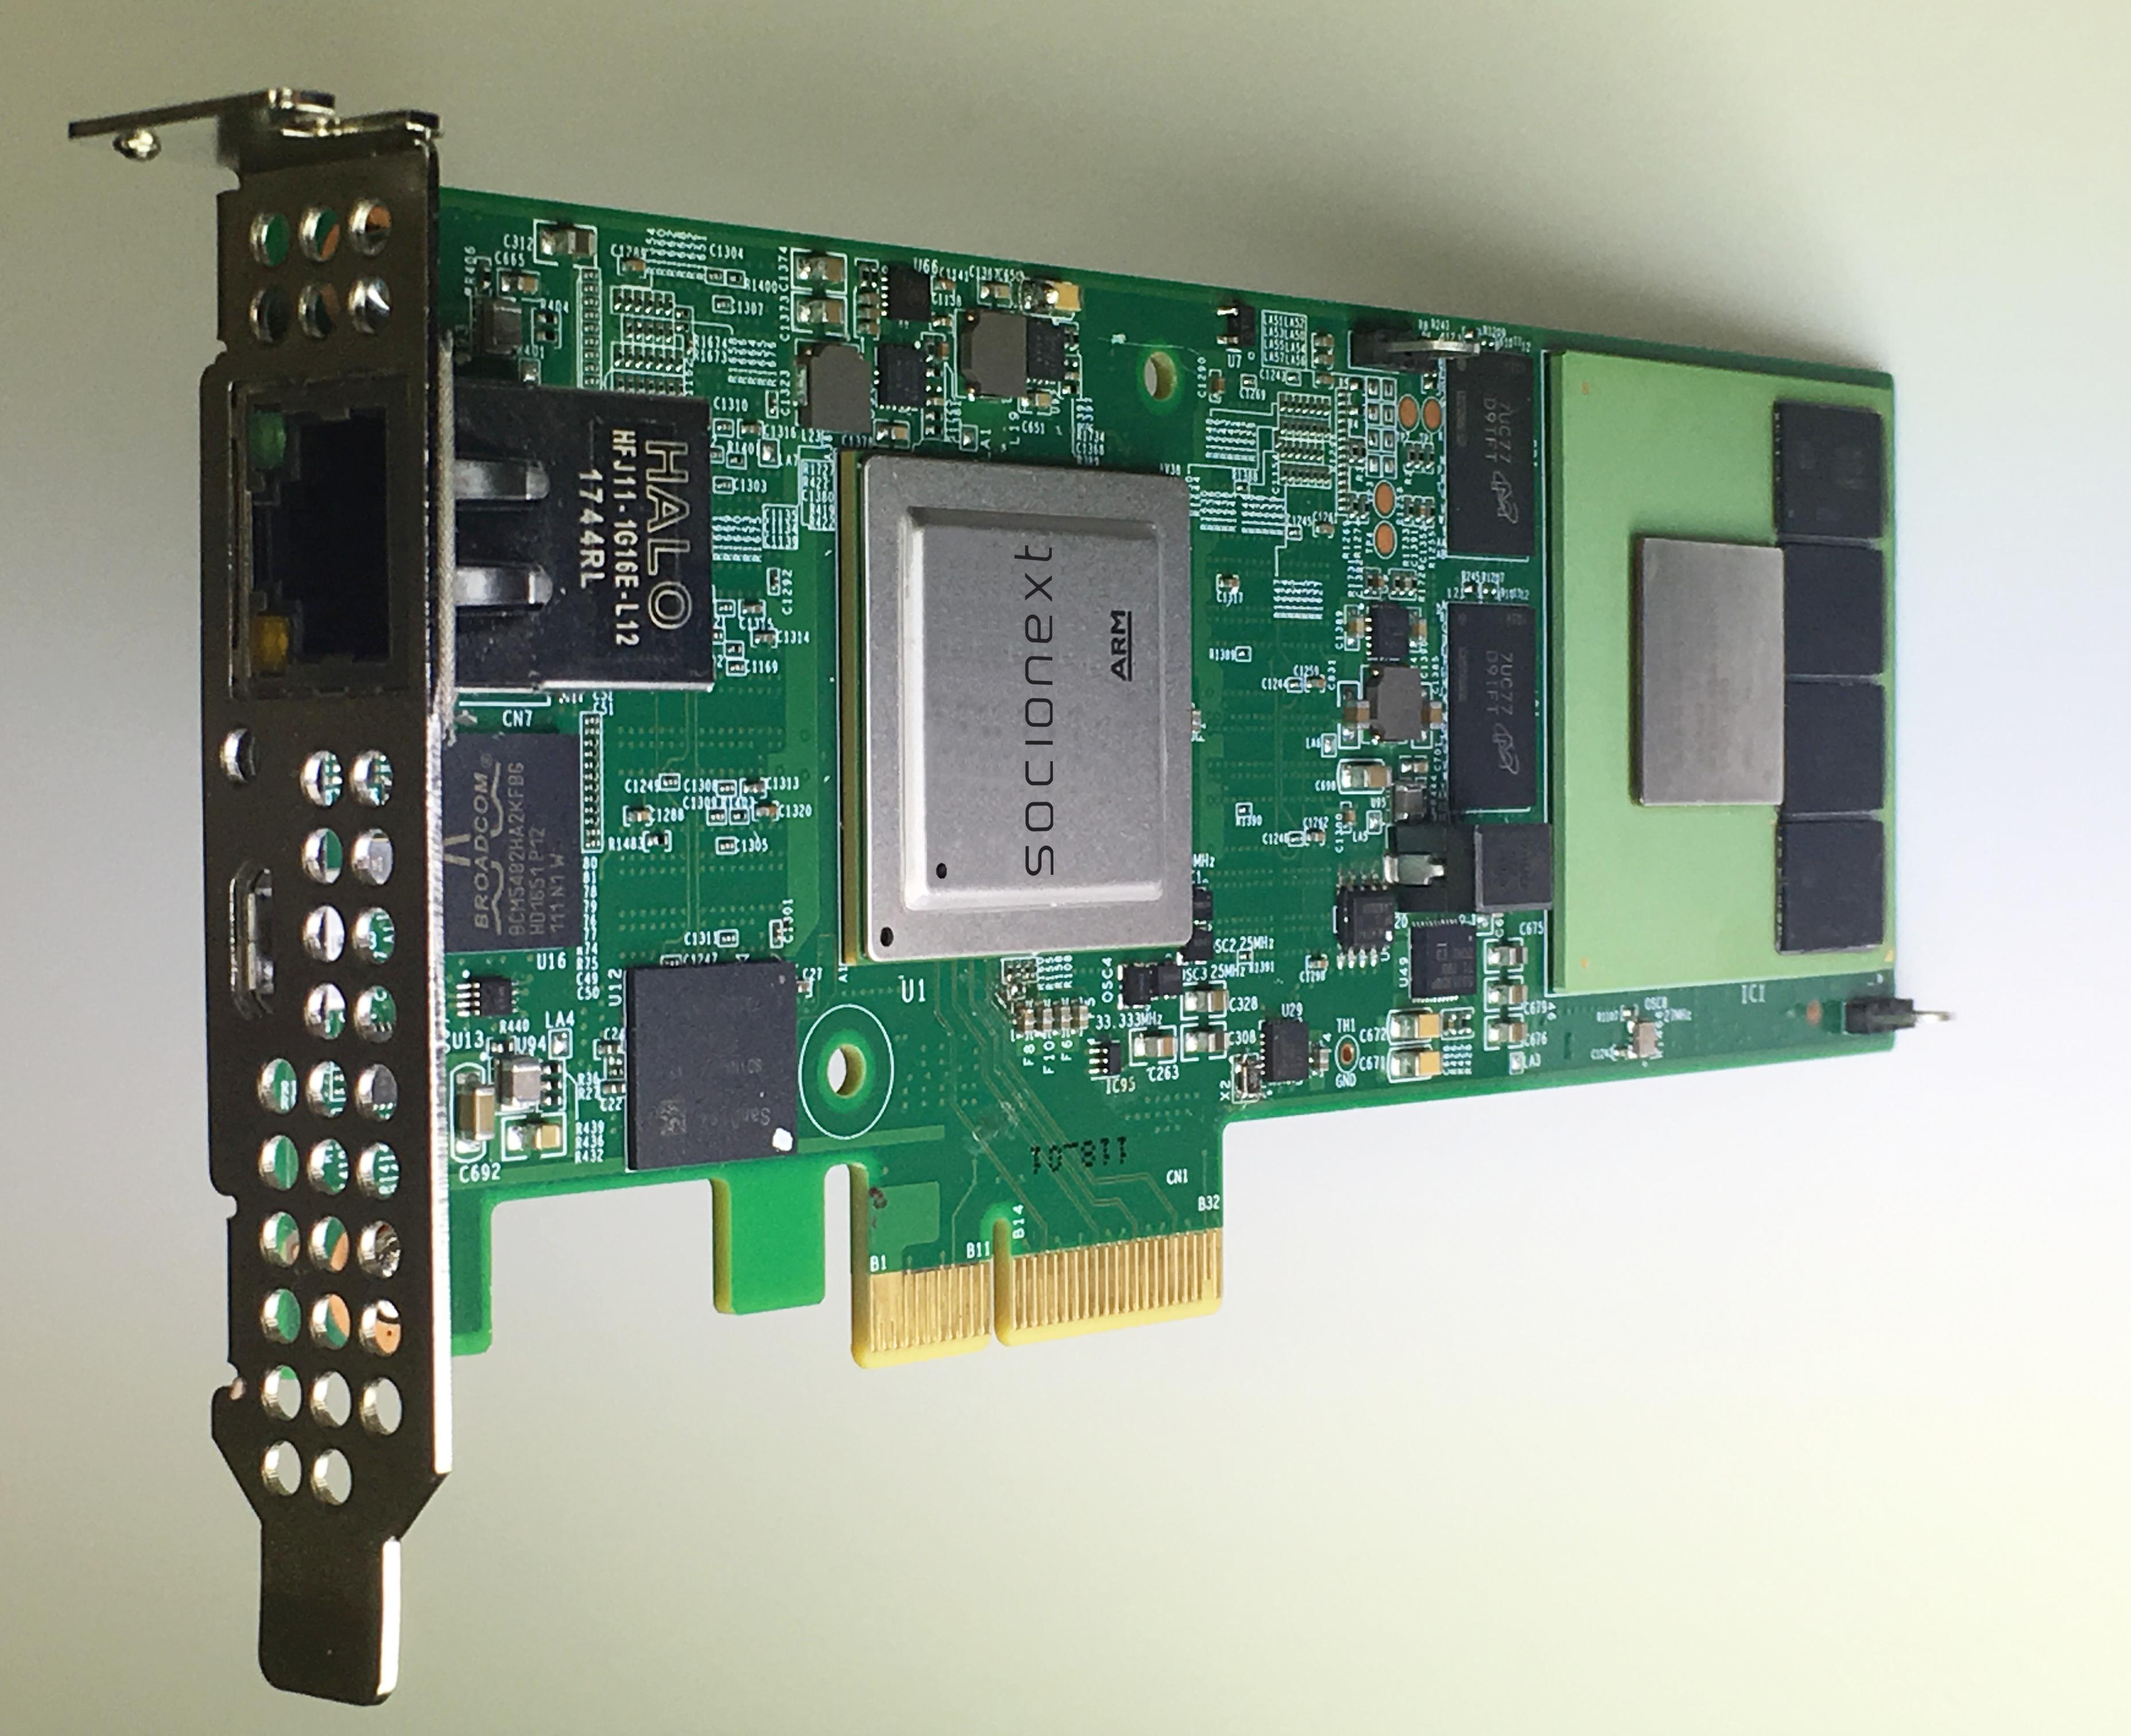 Socionext America Inc. releases the 'M820L-8K' media accelerator card